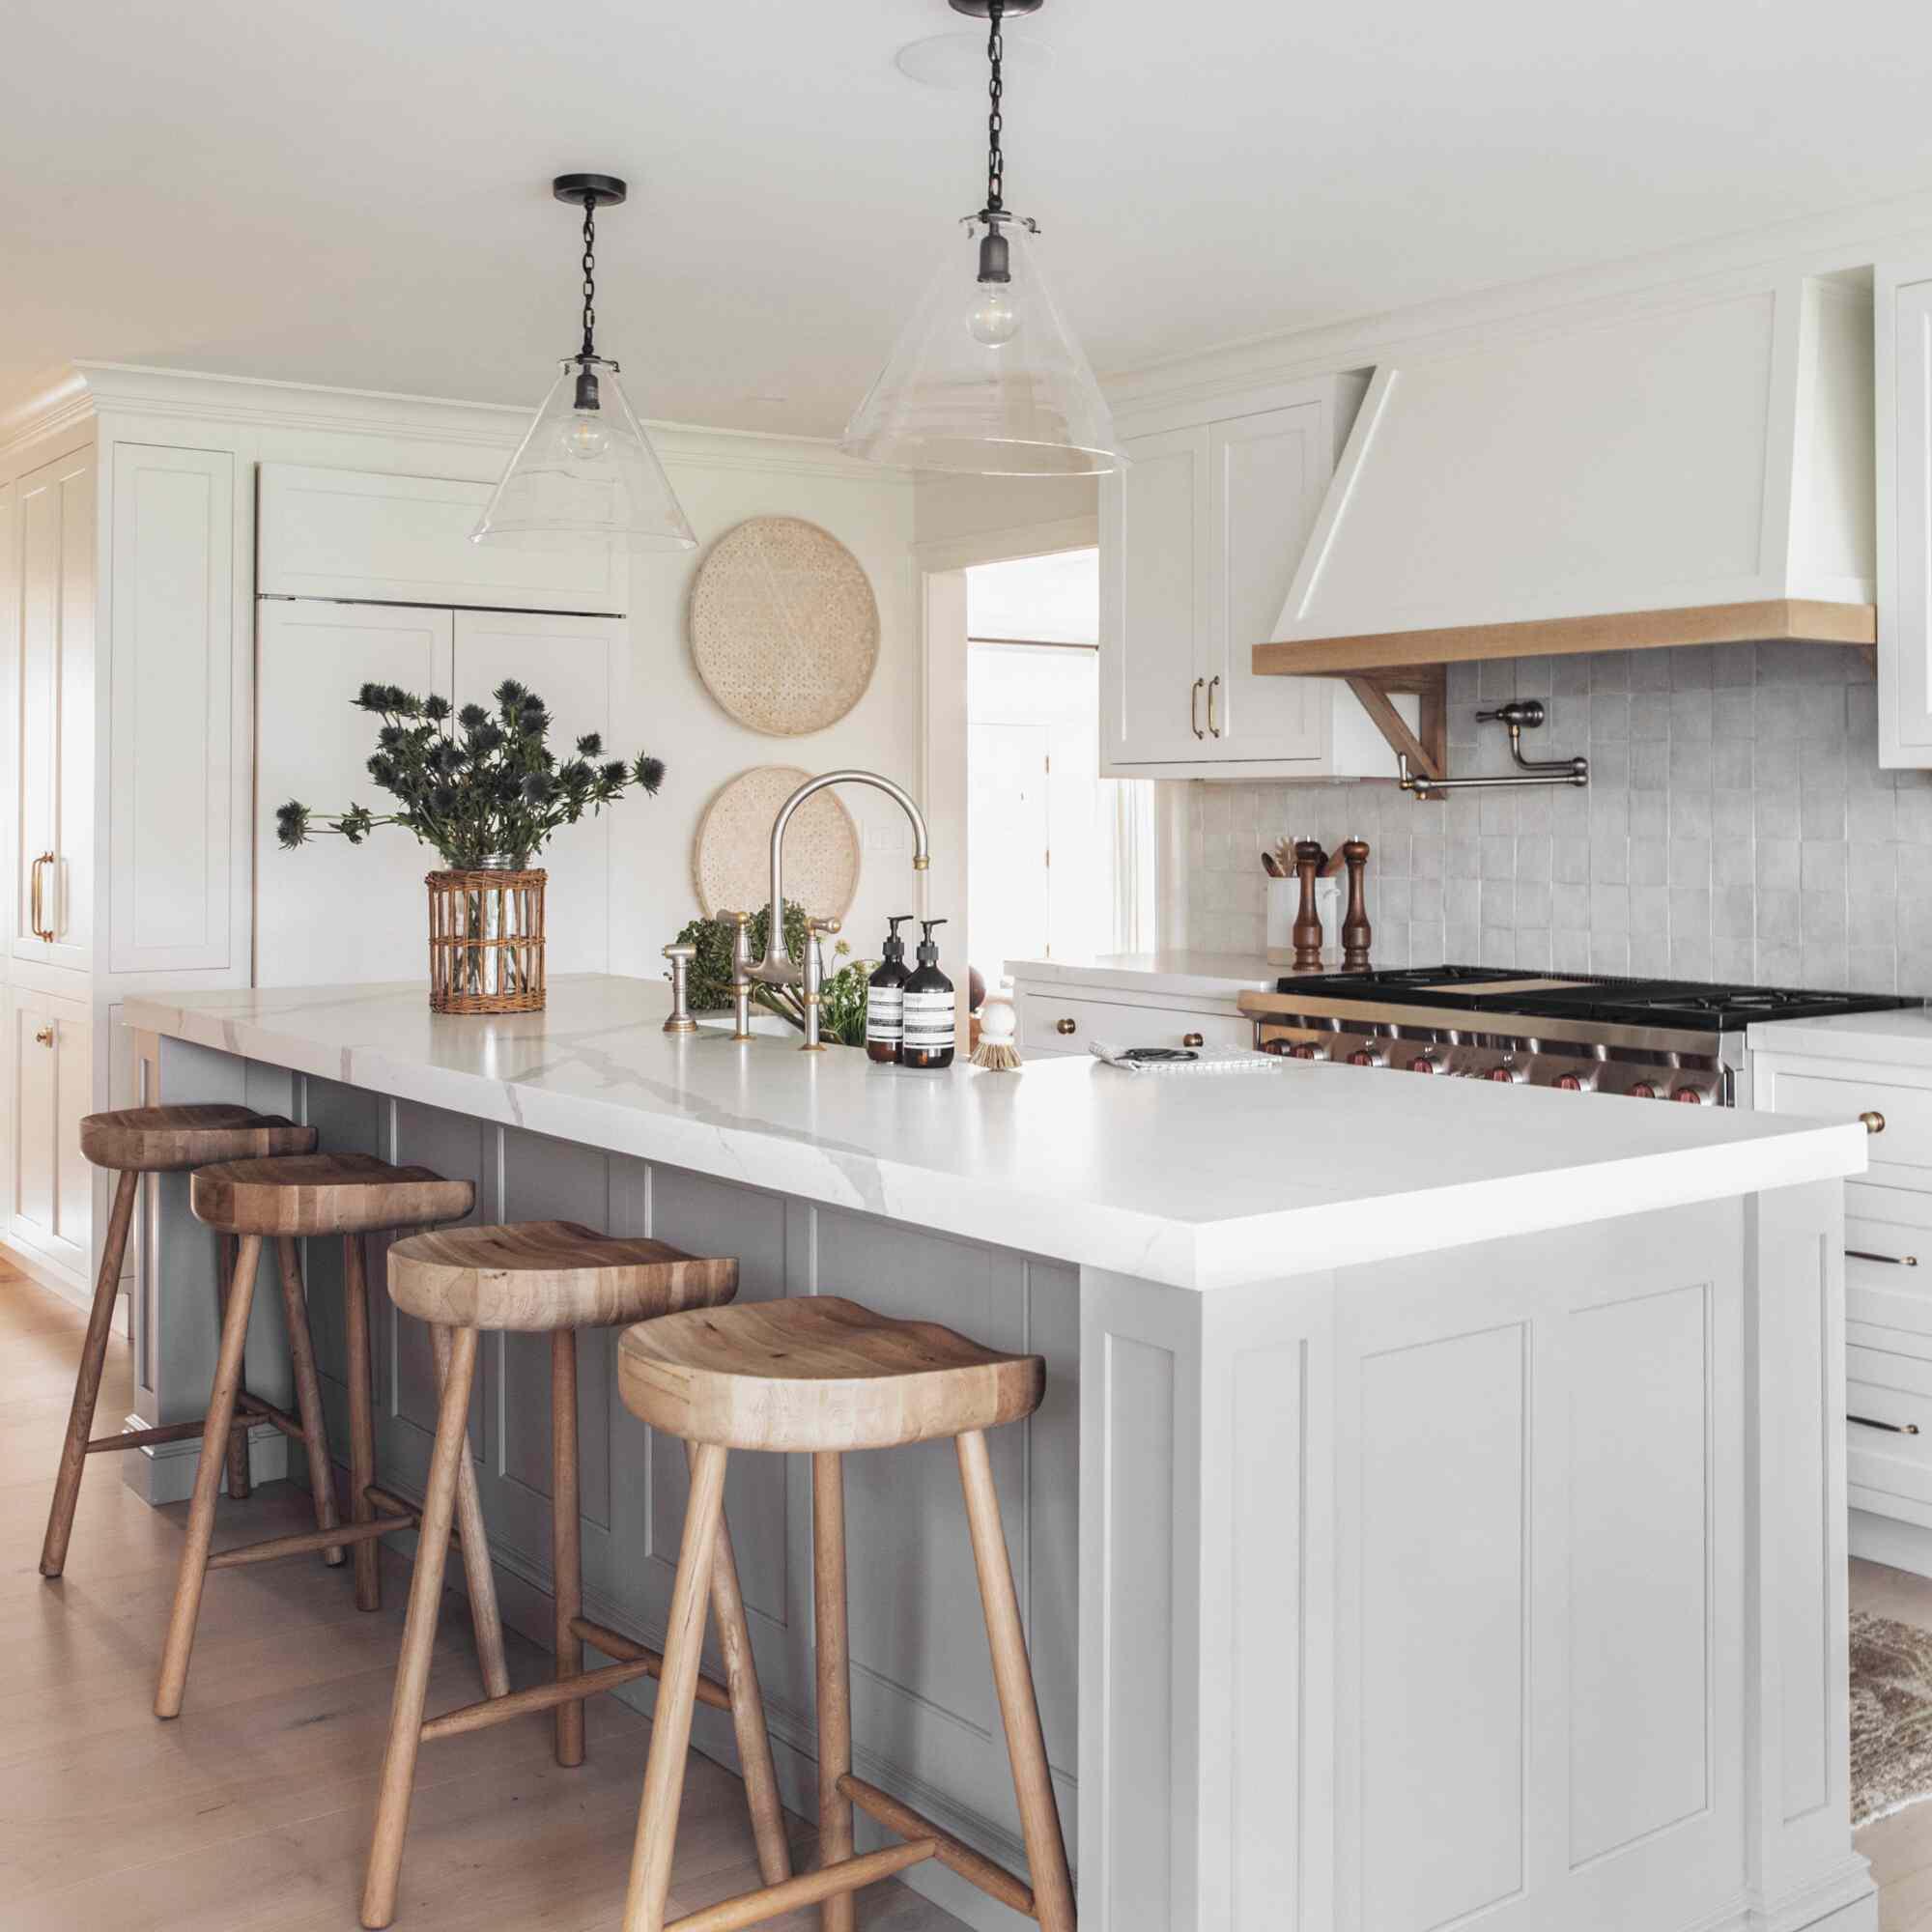 Minimalist kitchen with vases of greenery